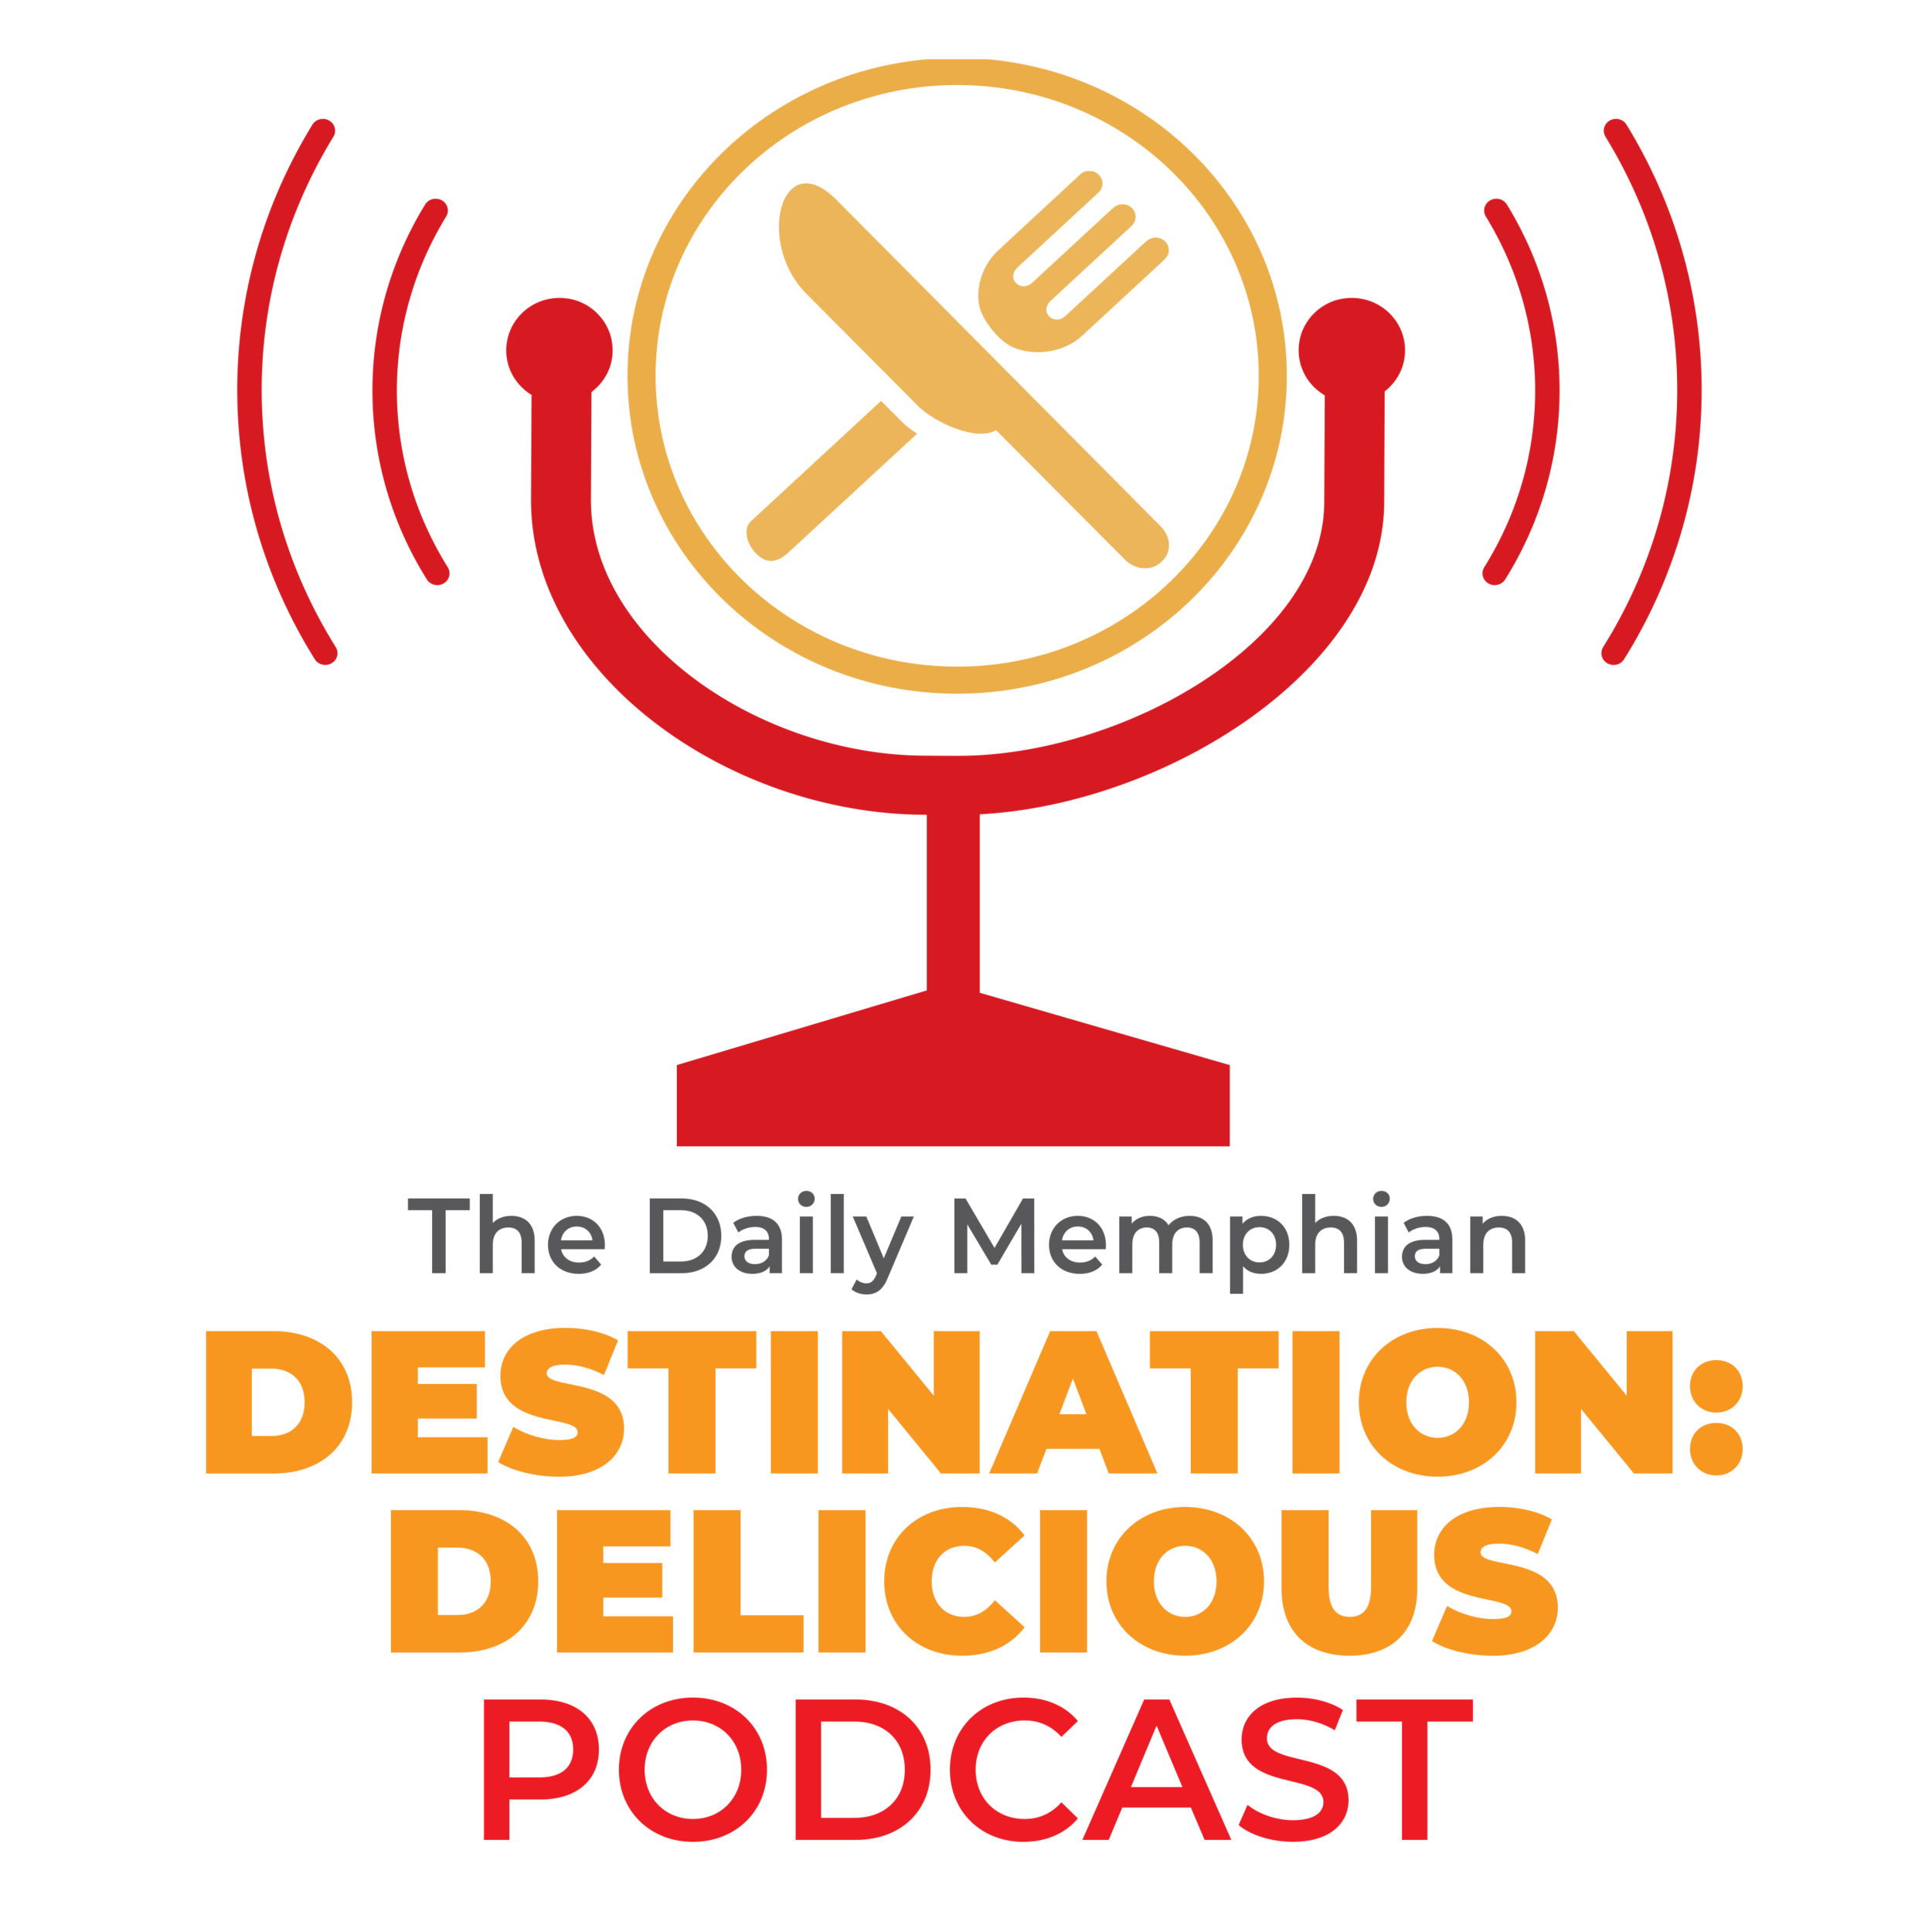 destination-delicious-podcast-logo-3000x3000.png